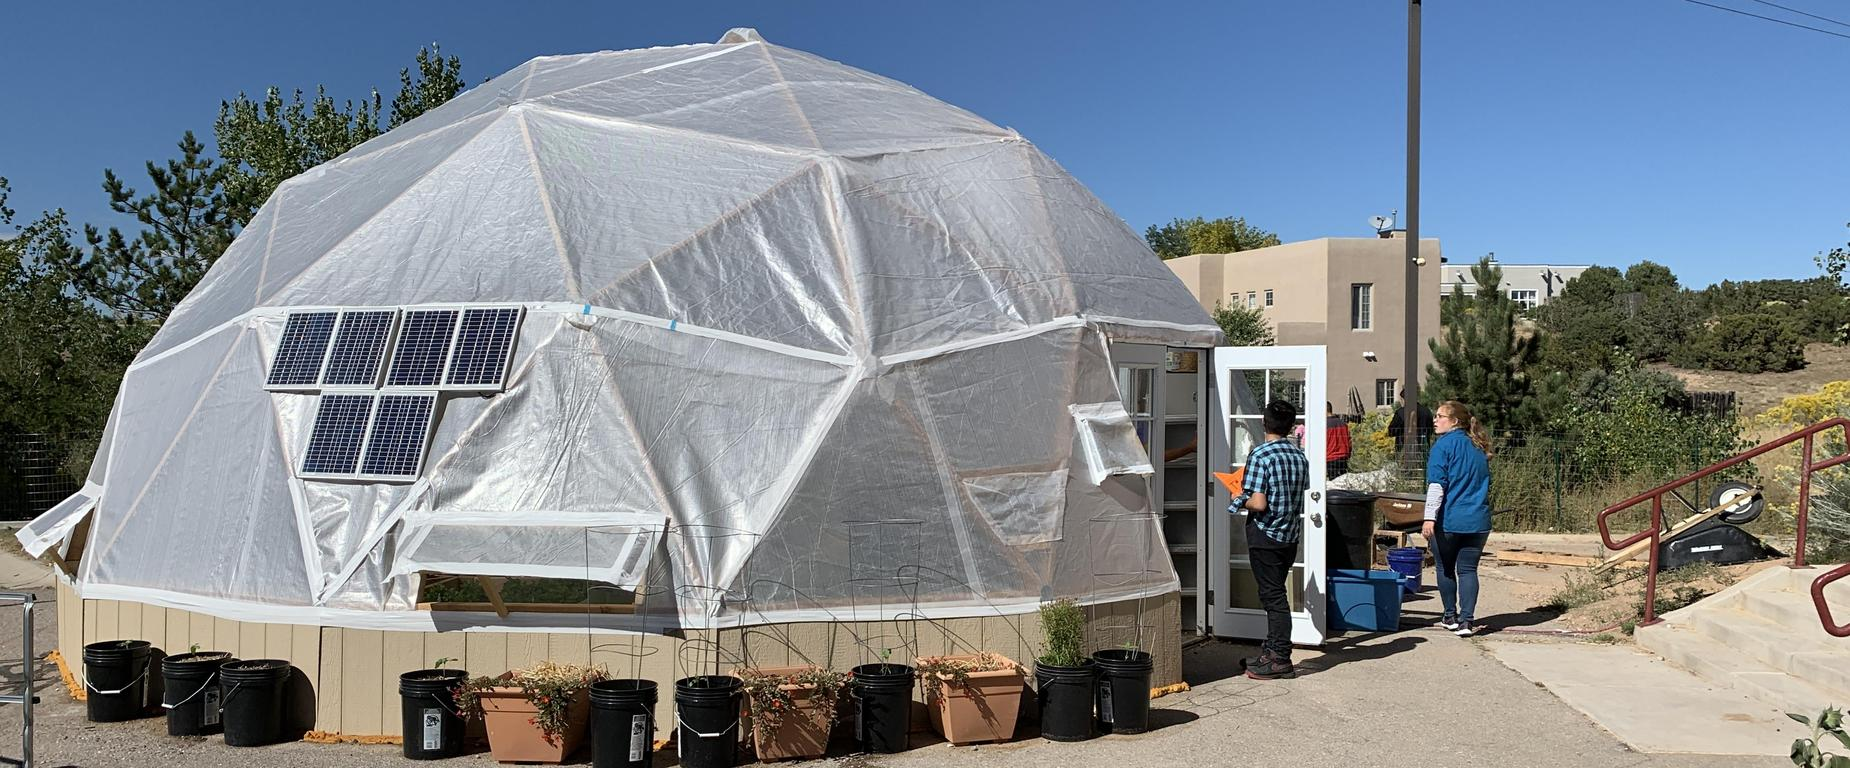 Hydroponics Dome